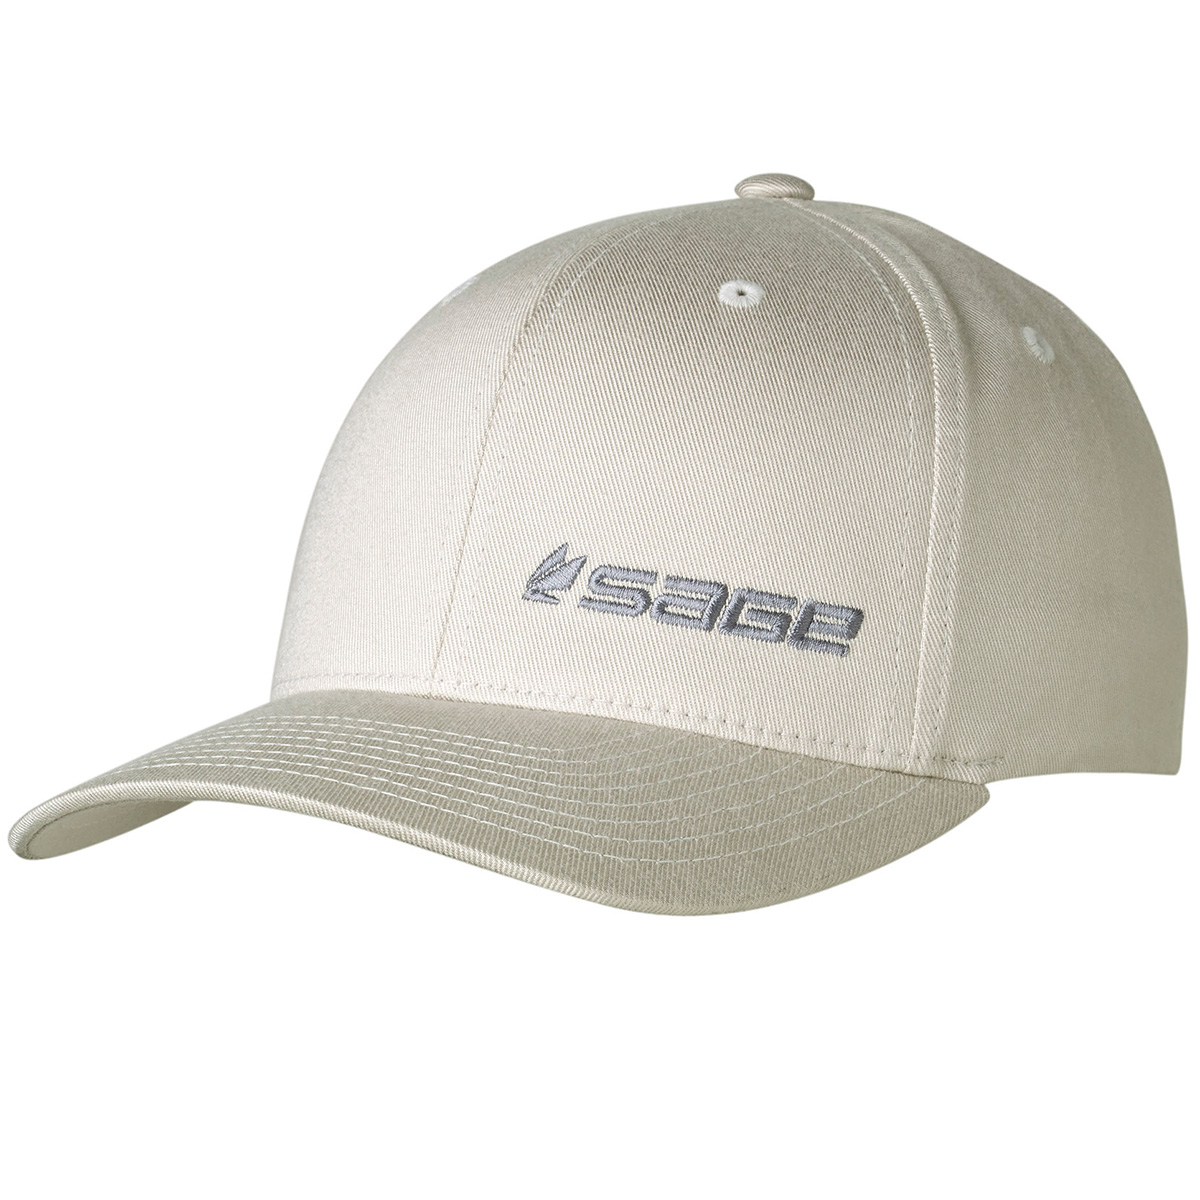 Sage flexfit fishing caps taimen for Sage fly fishing hat